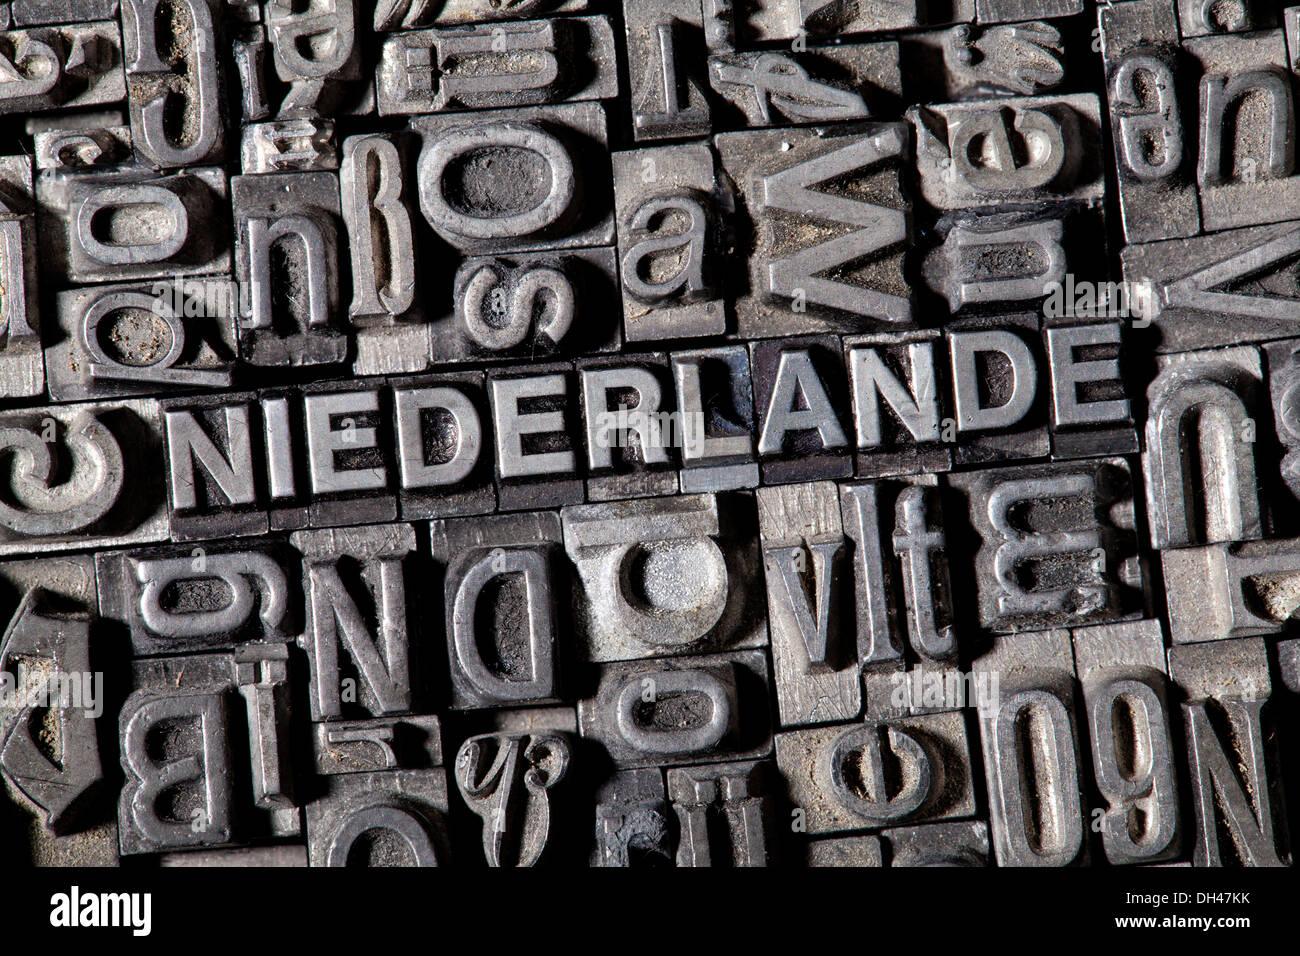 Old lead letters forming the word NIEDERLANDE, German for Netherlands - Stock Image